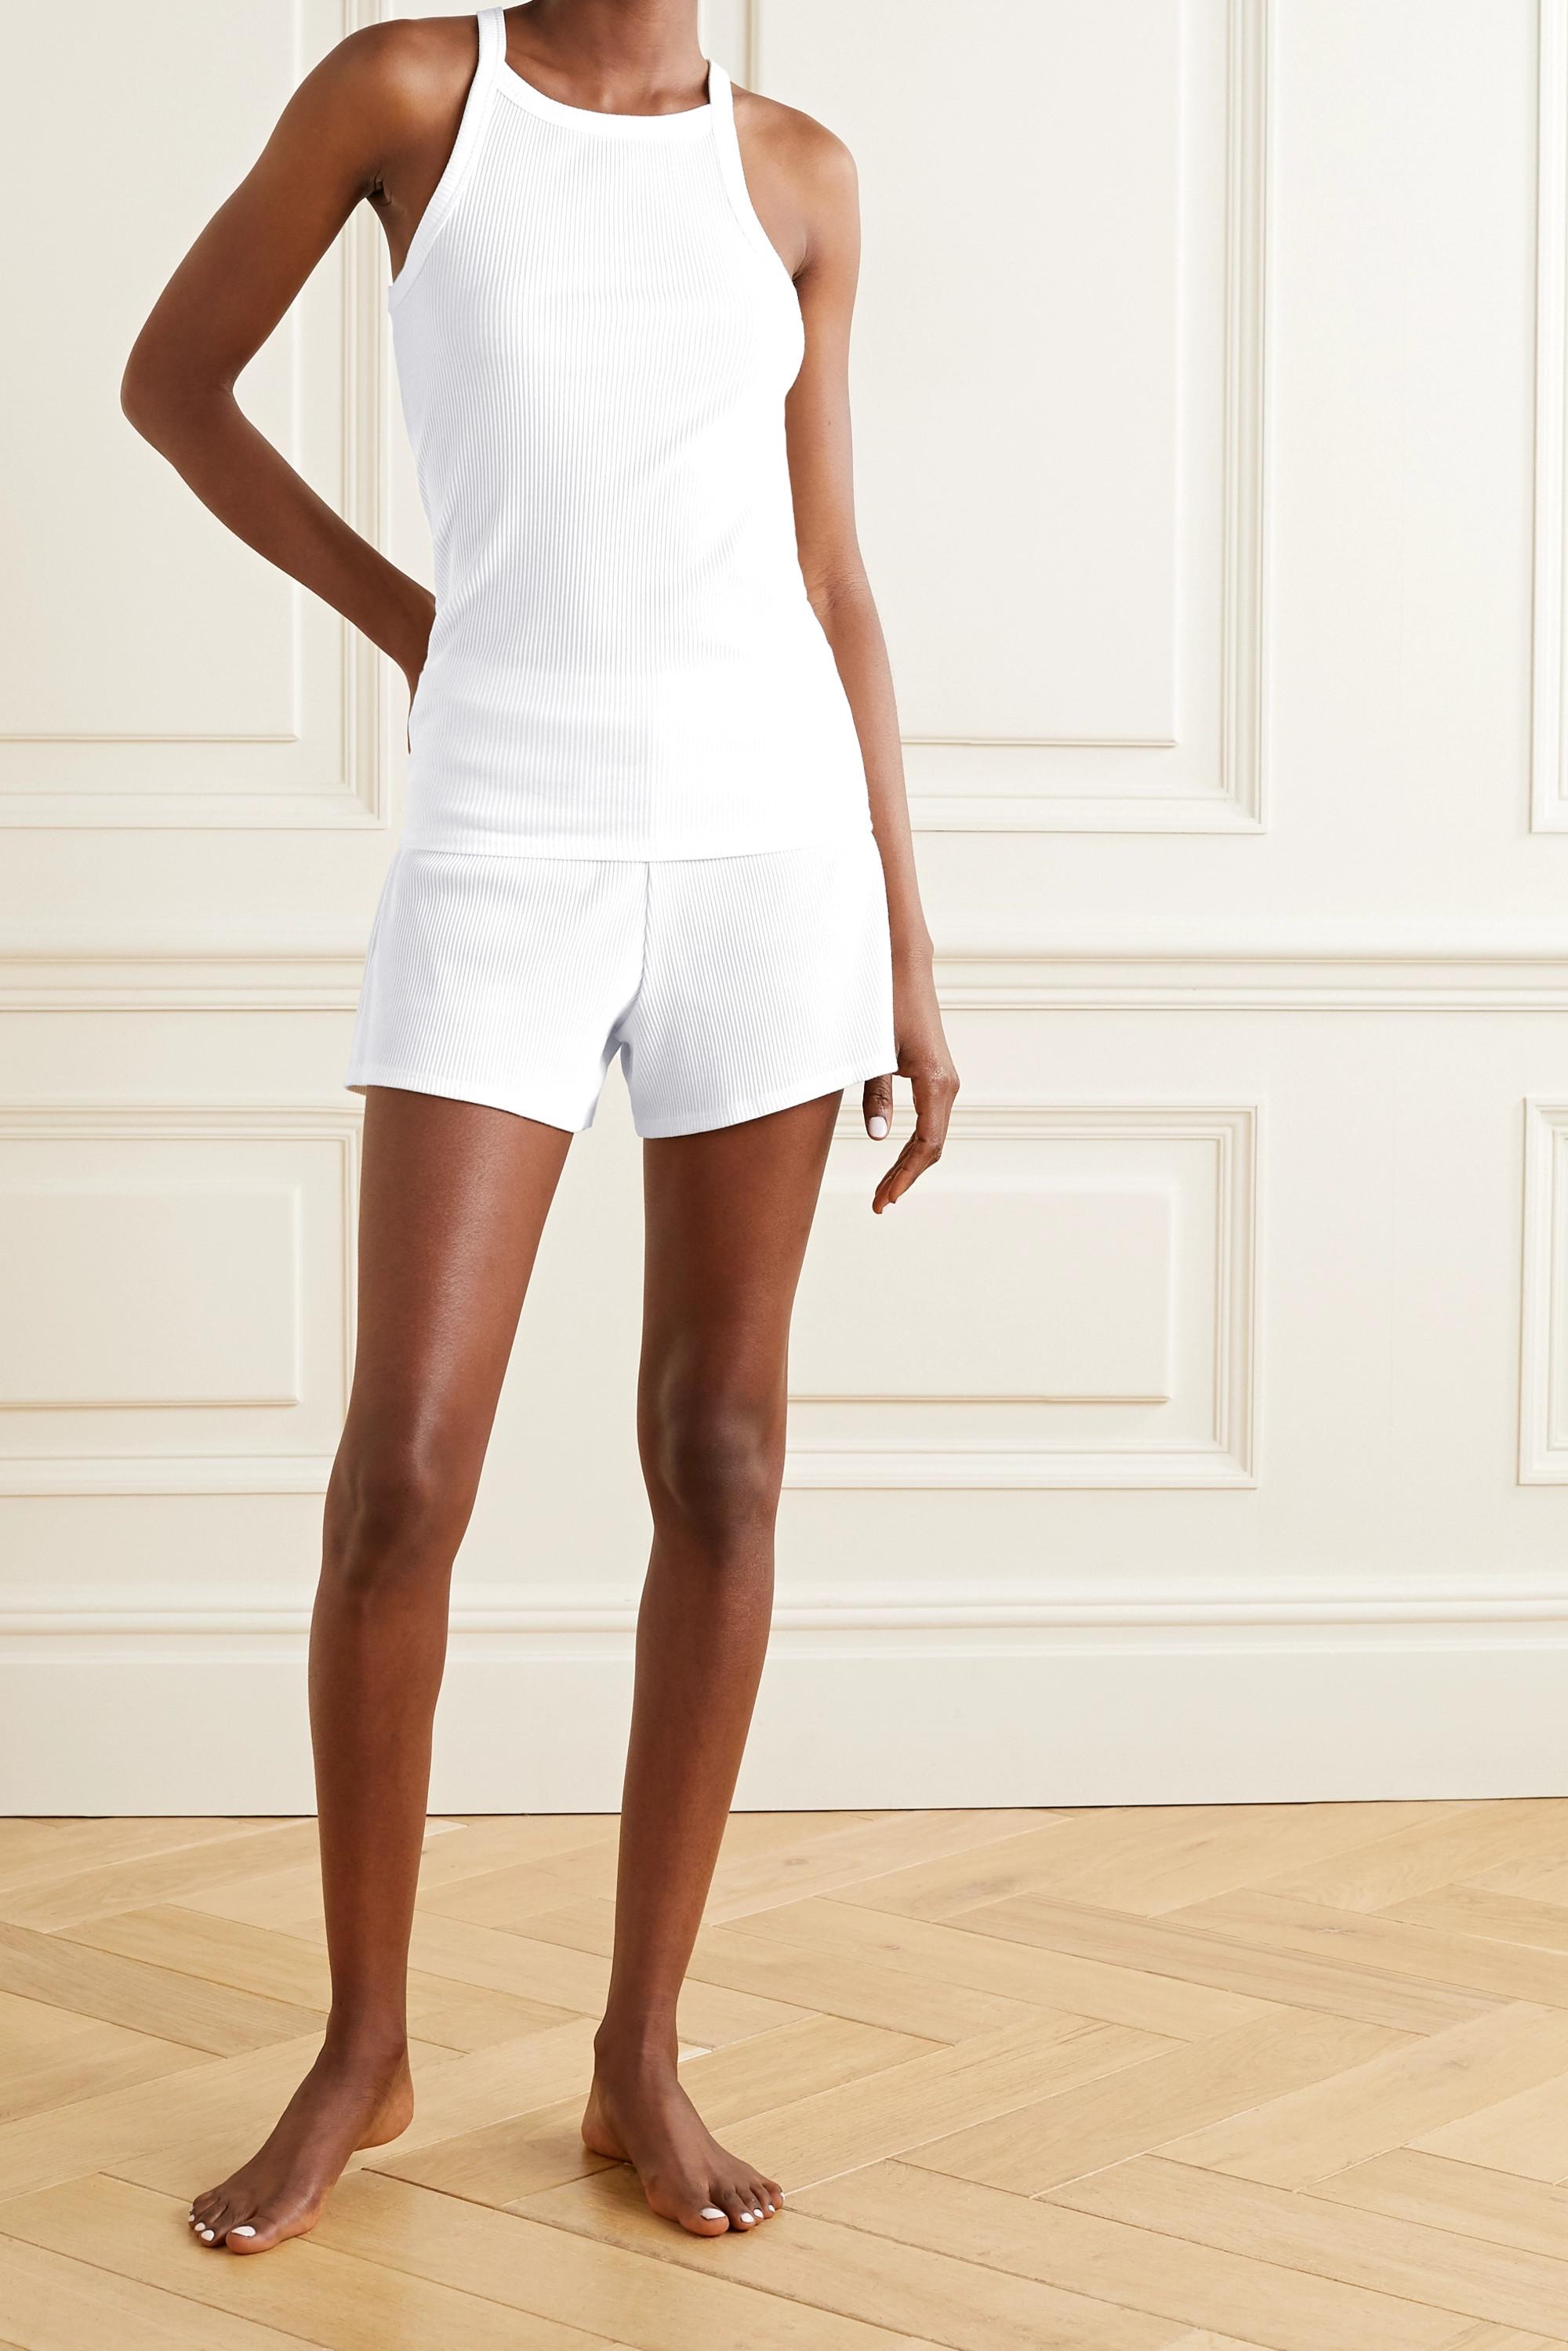 Skin Indigo ribbed stretch-Pima cotton jersey shorts